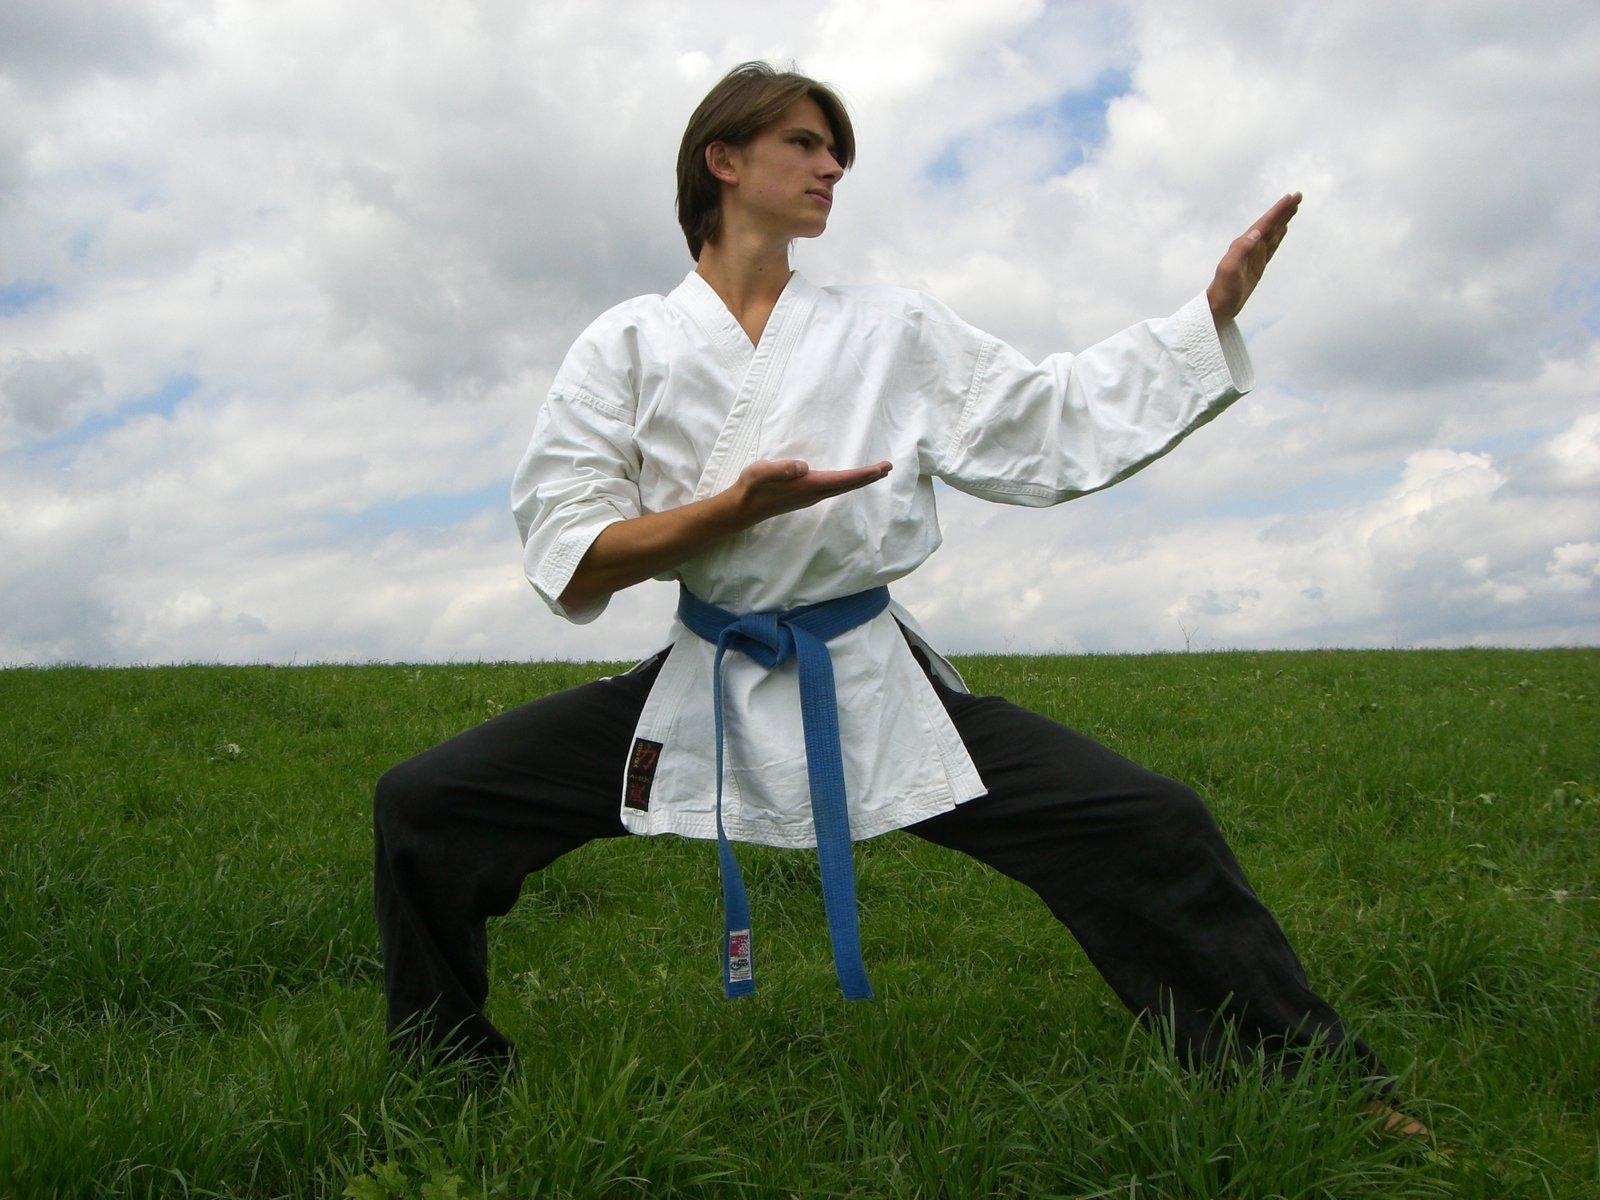 Doing karate